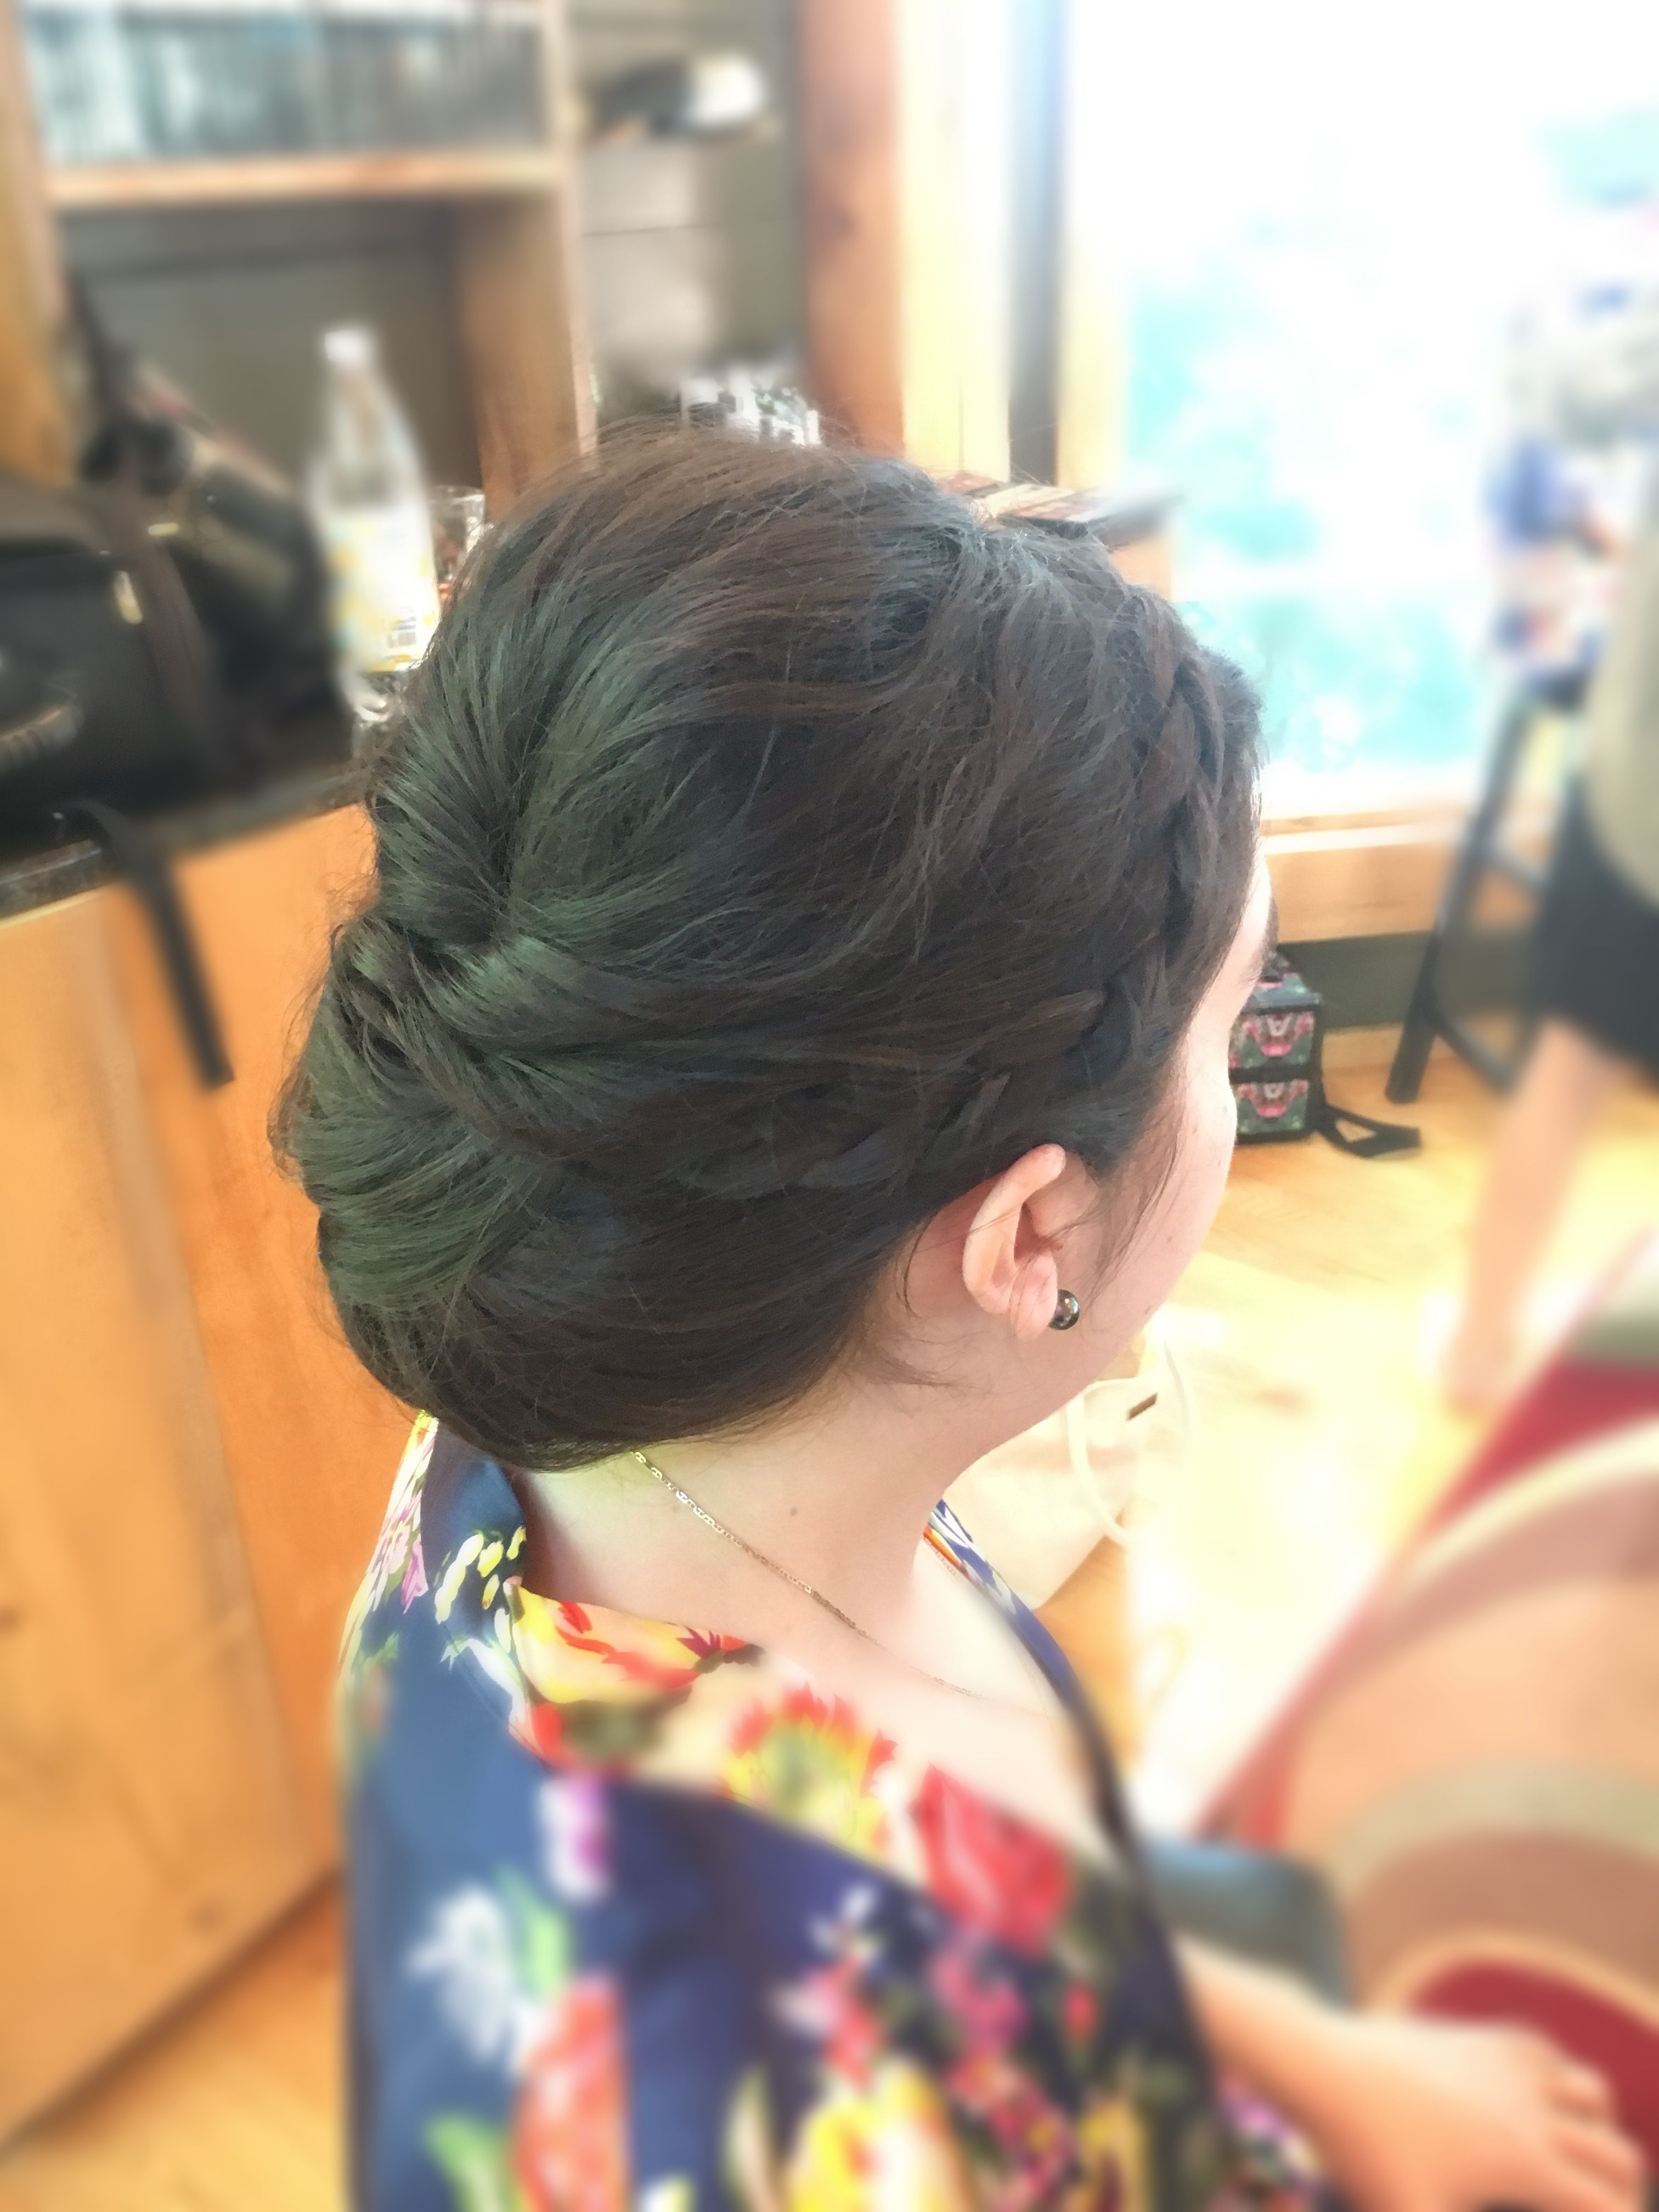 Bridal hair by Jillain at jluxe salon in Syracuse New York